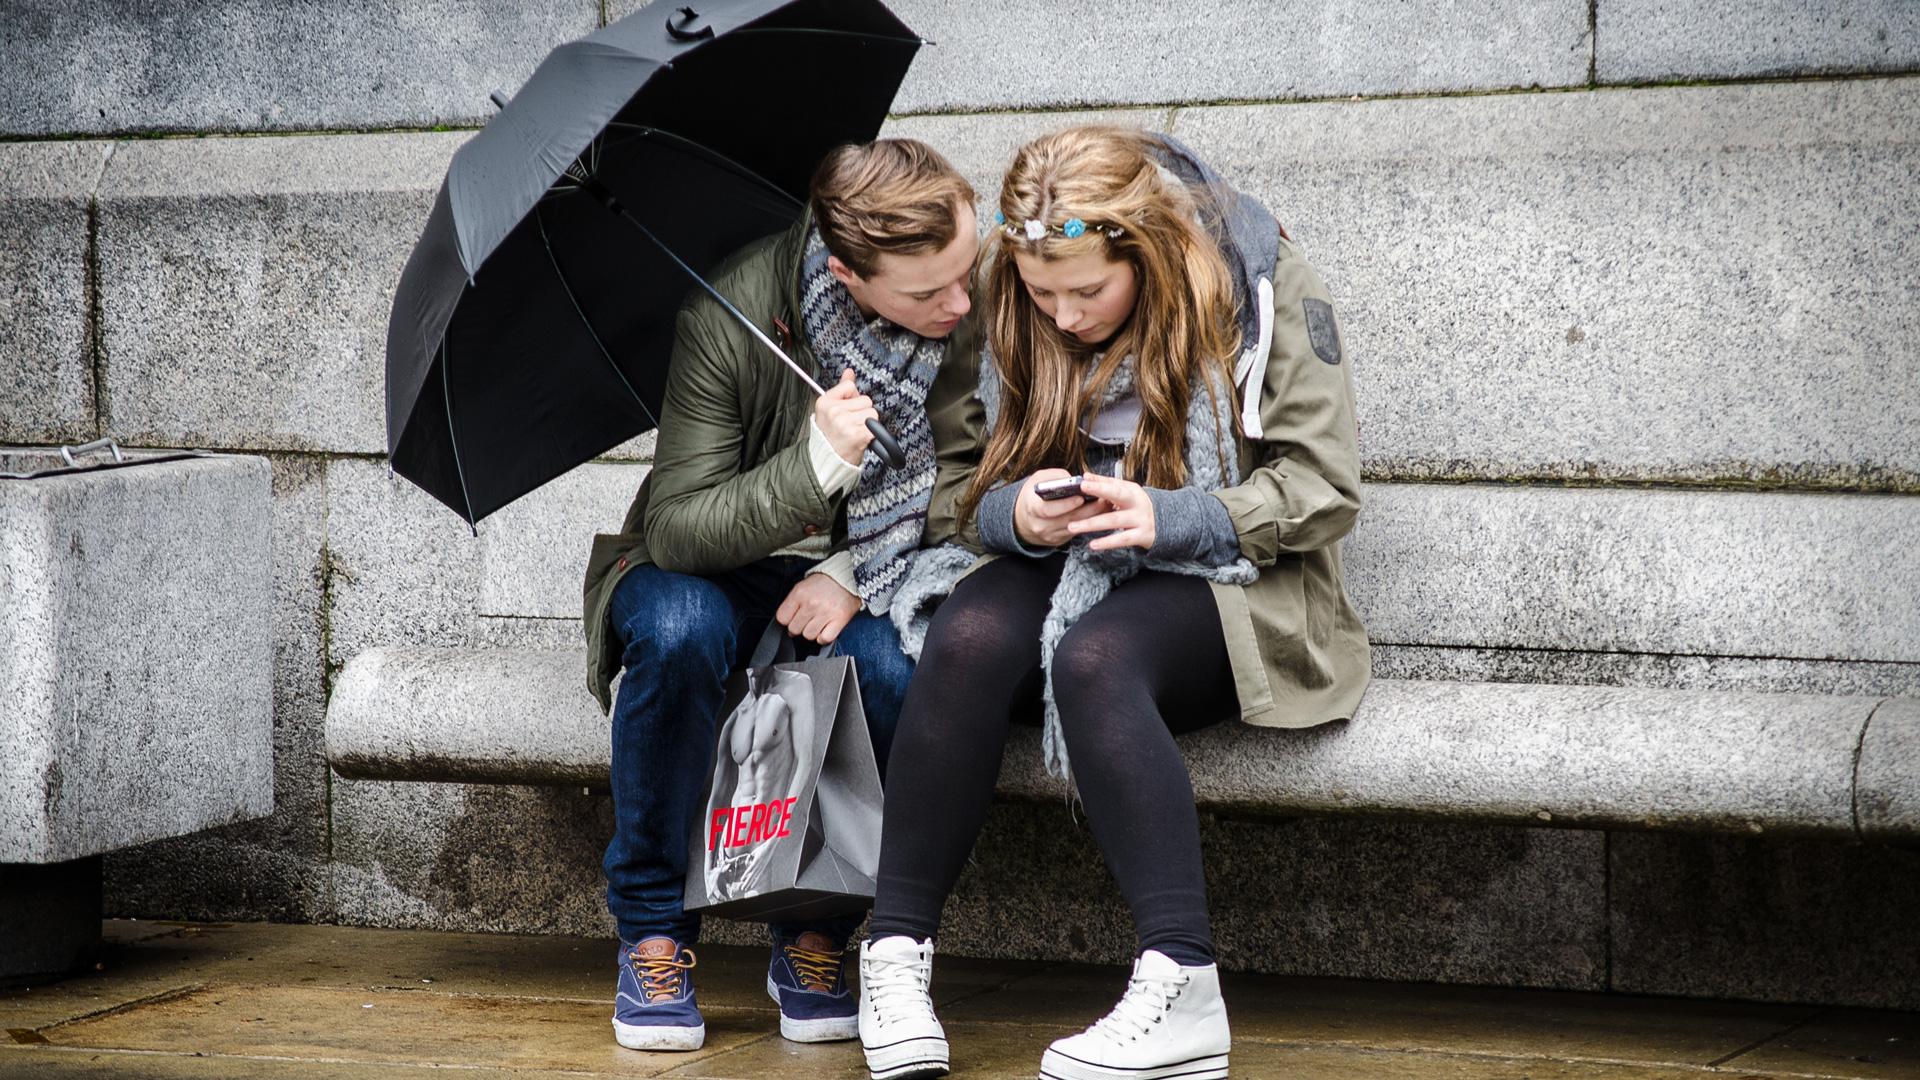 queer amicale rencontres apps Estonie datant gratuit